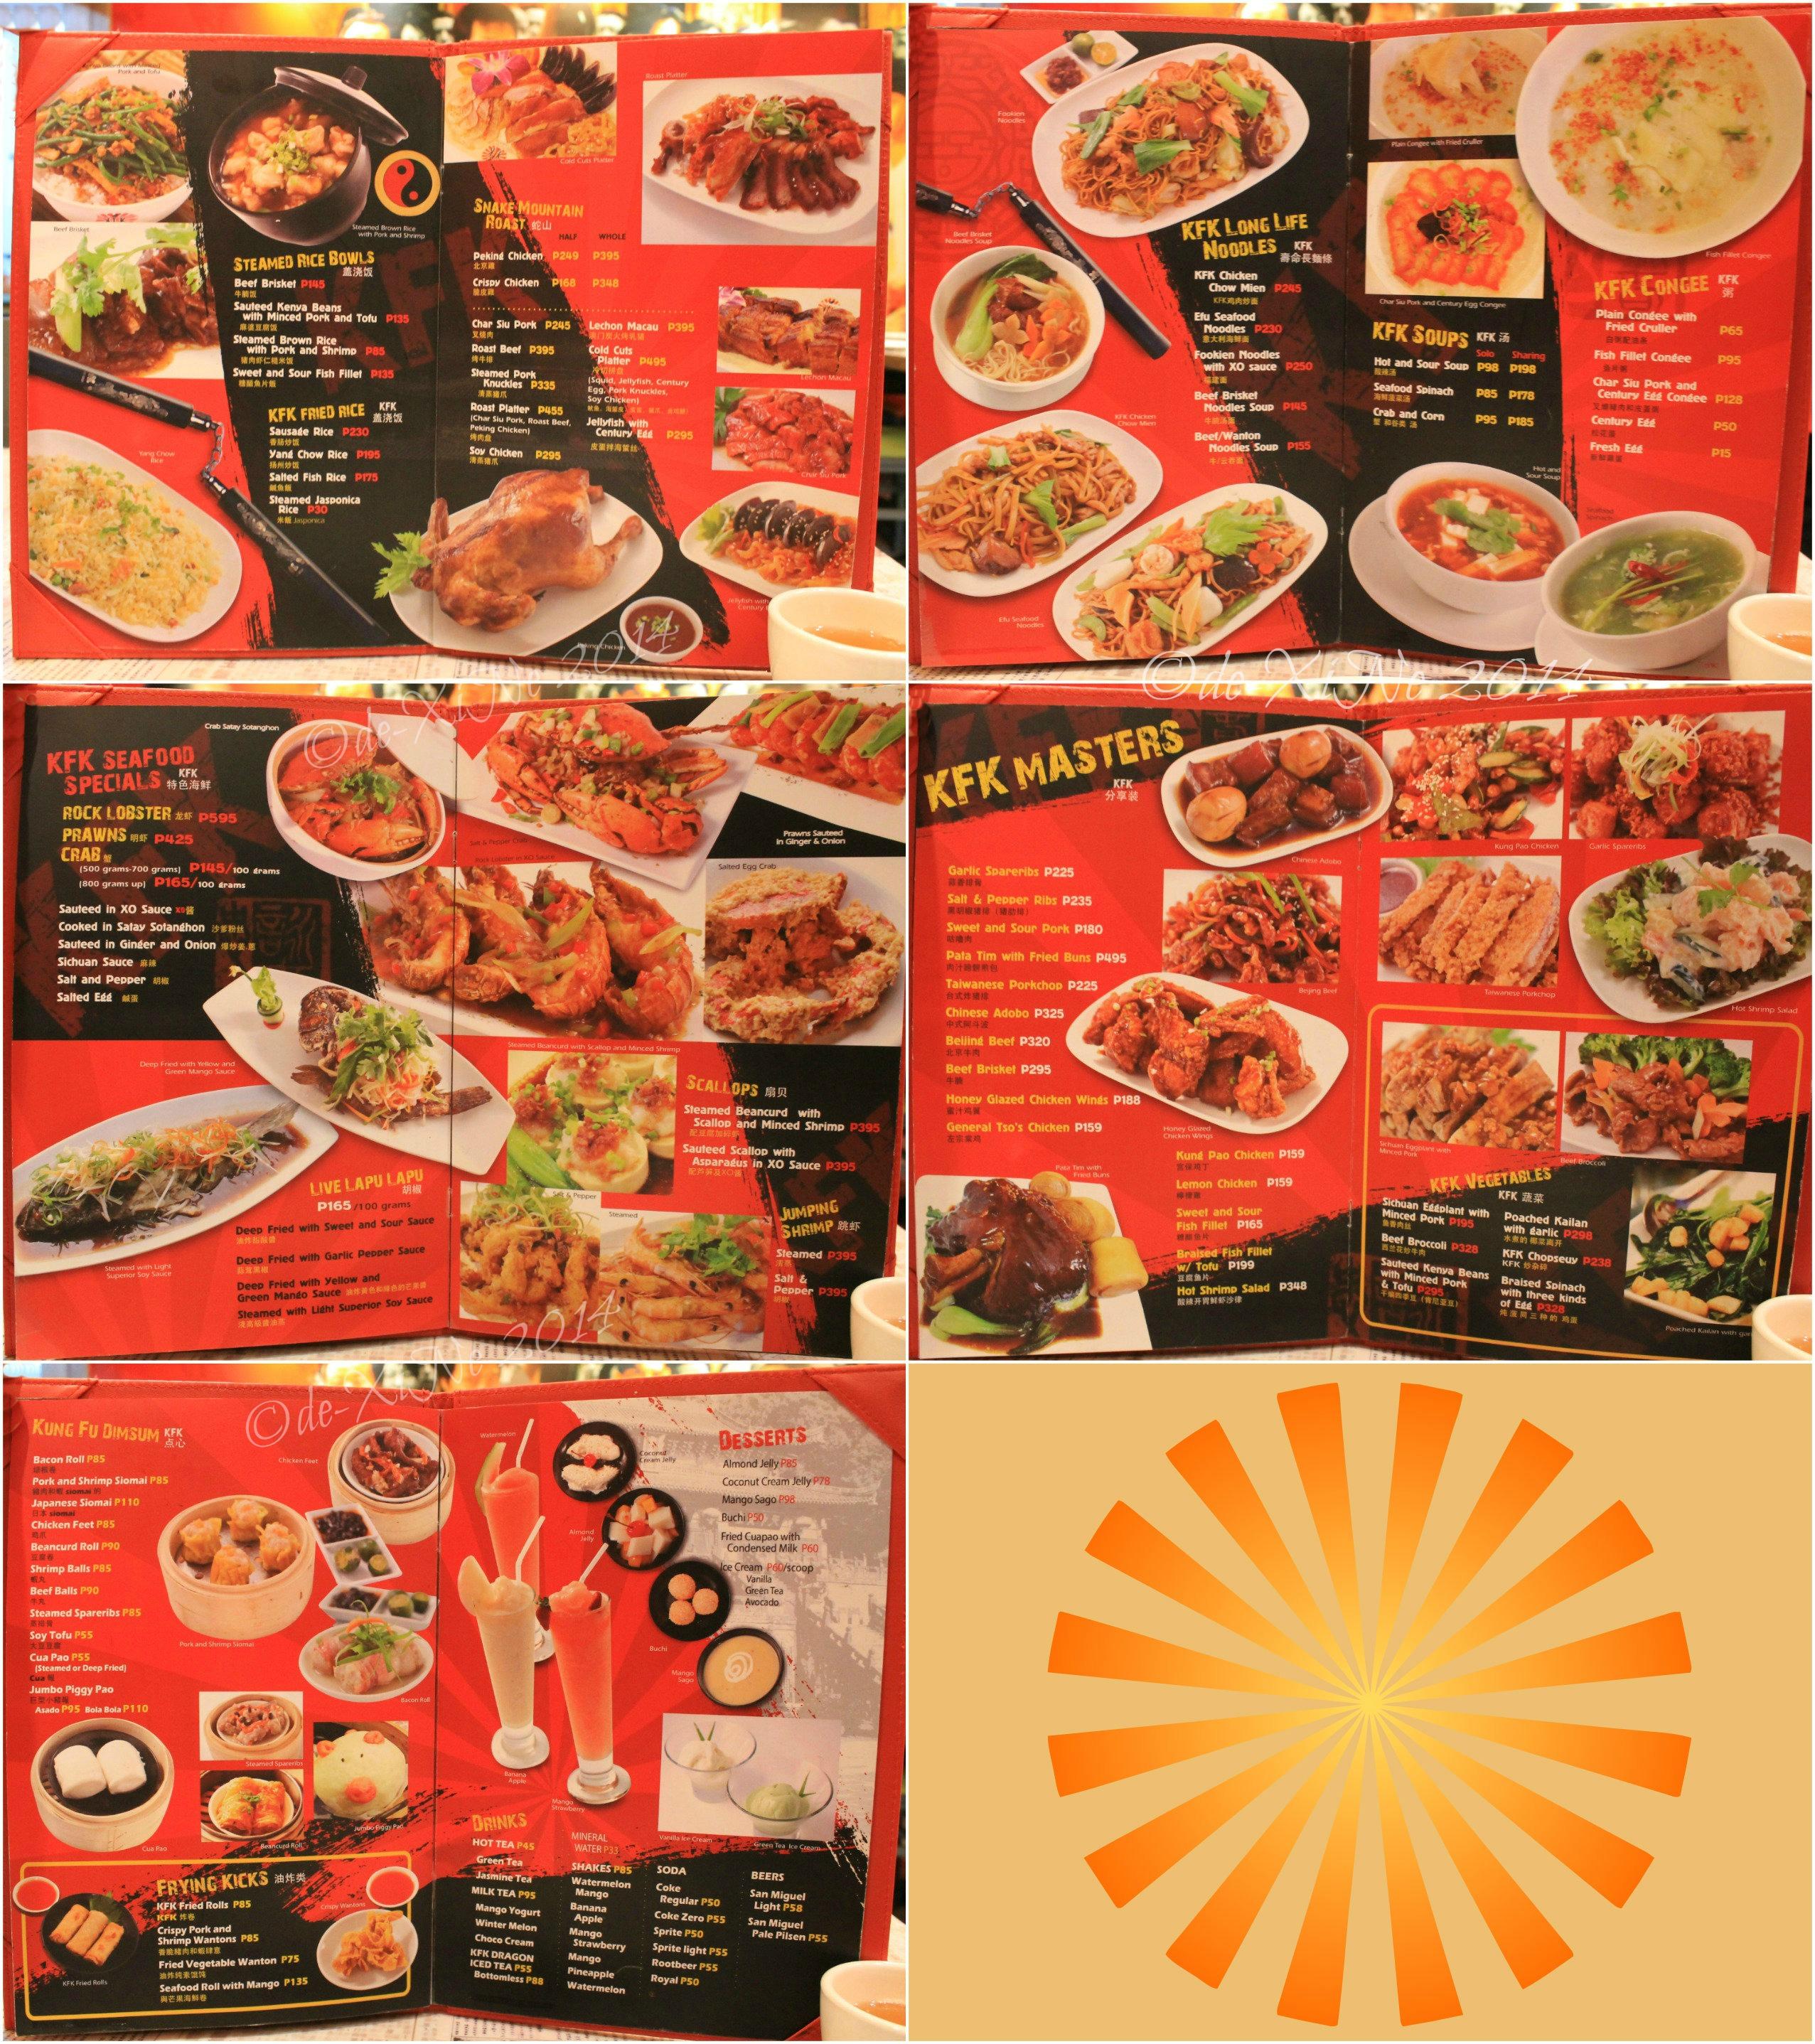 kung fu kitchen baguio menu - Kung Fu Kitchen